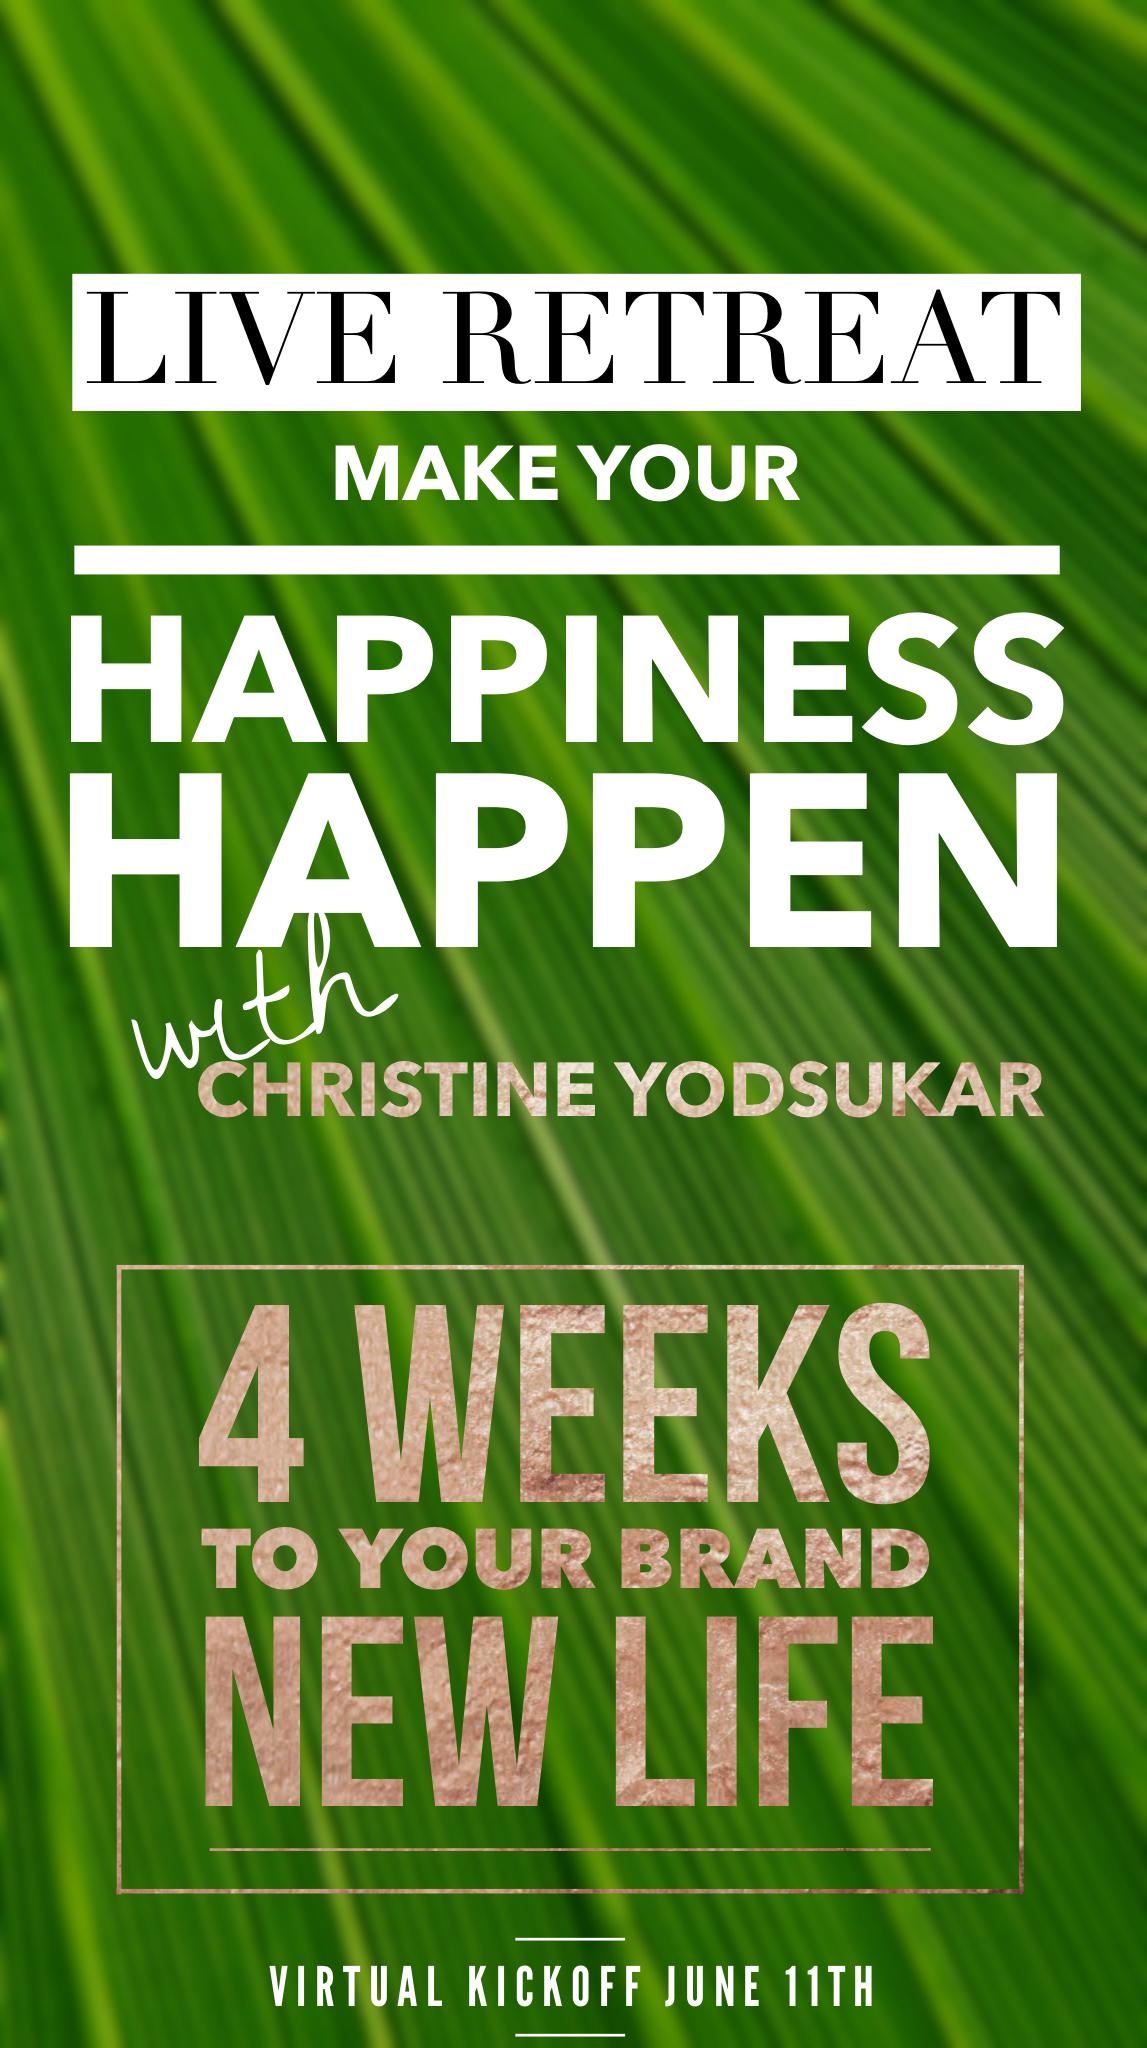 make-happiness-happen-christine-yodsukar-june-2018